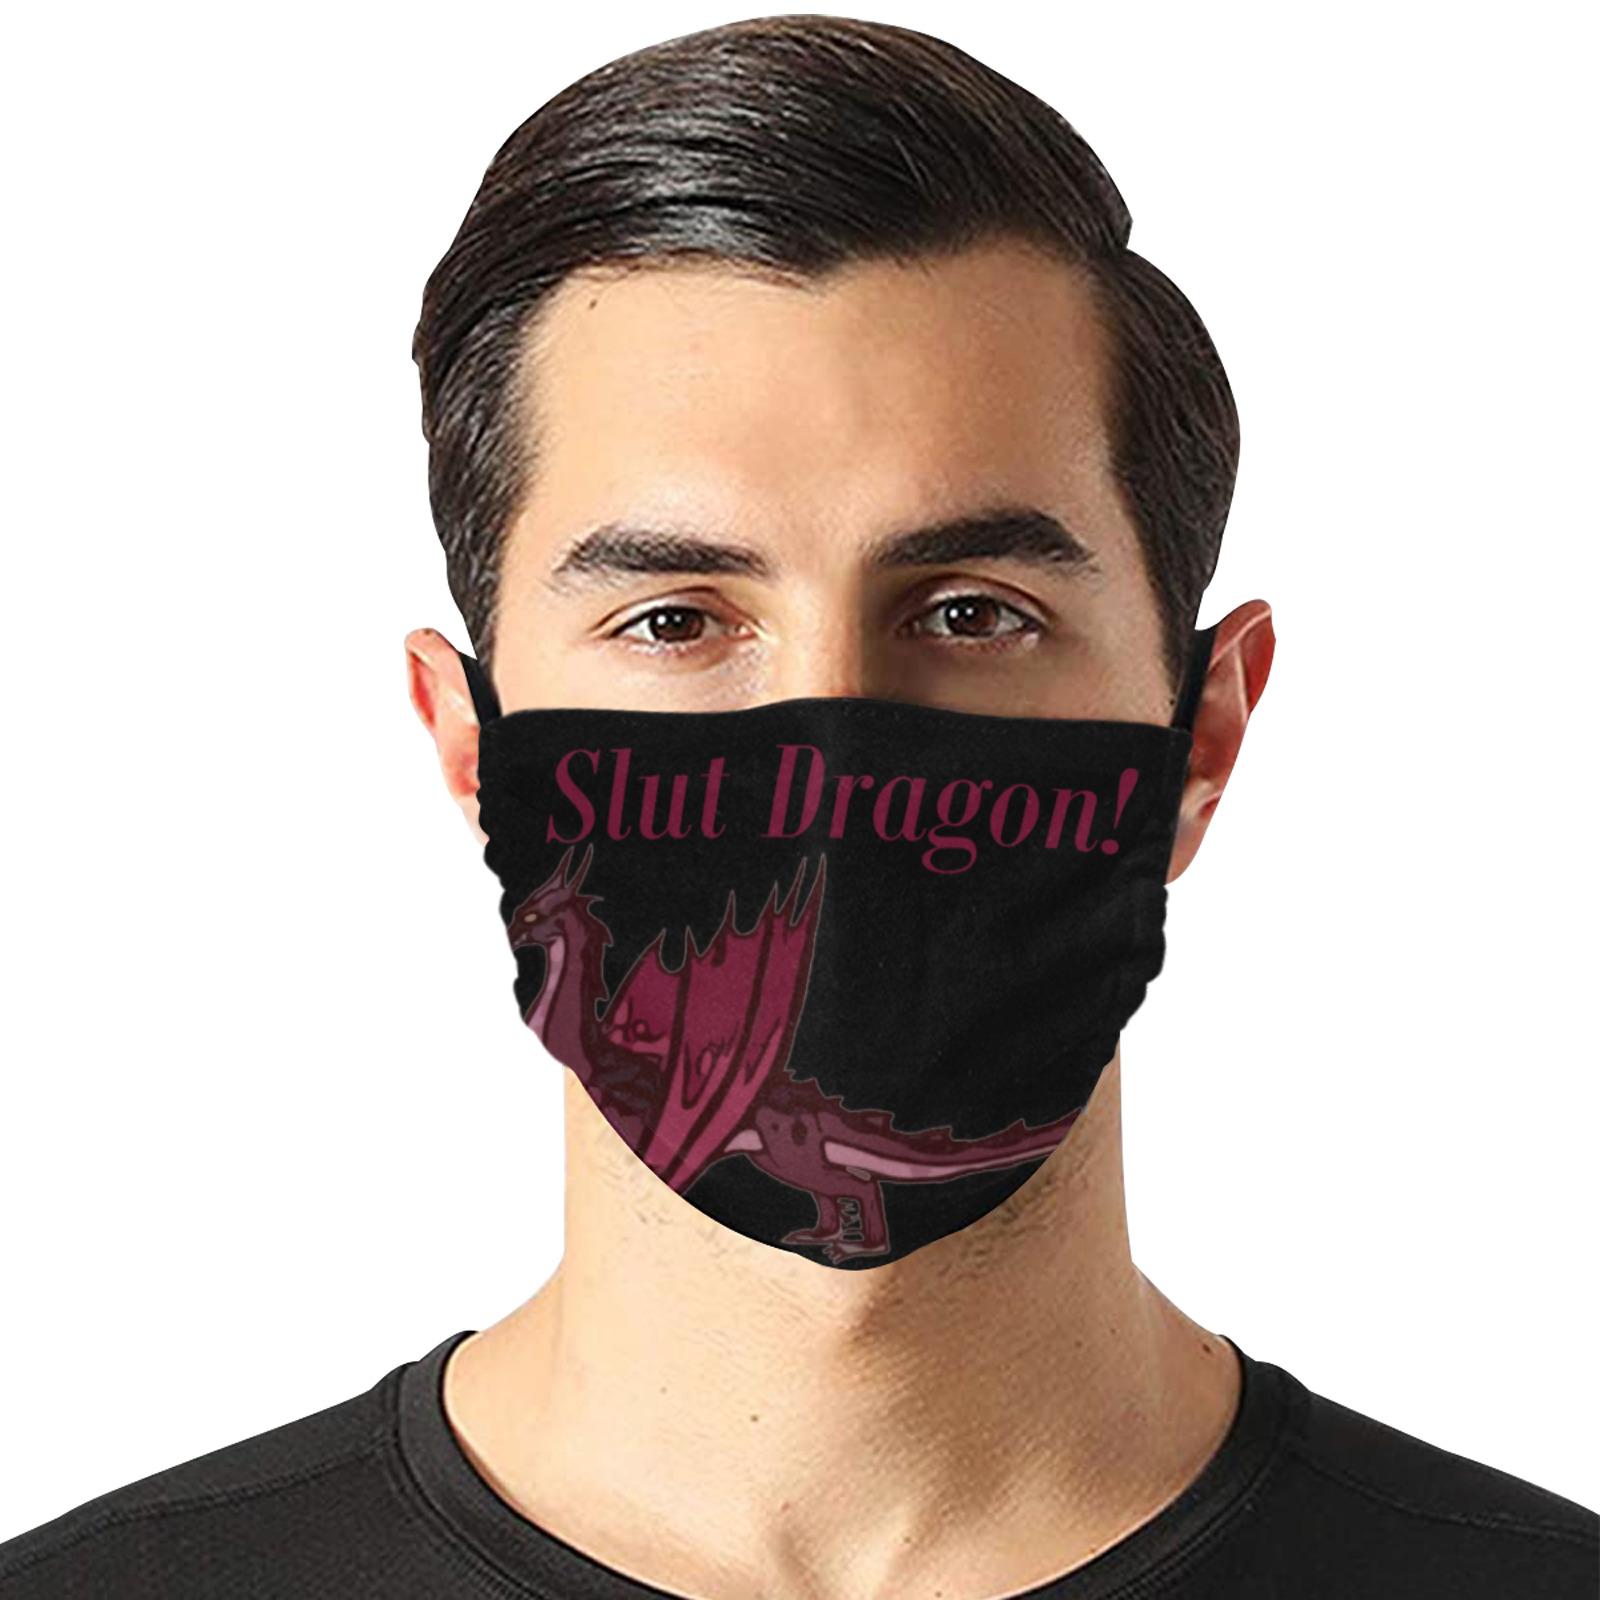 Slut Dragon Flat Mouth Mask with Drawstring